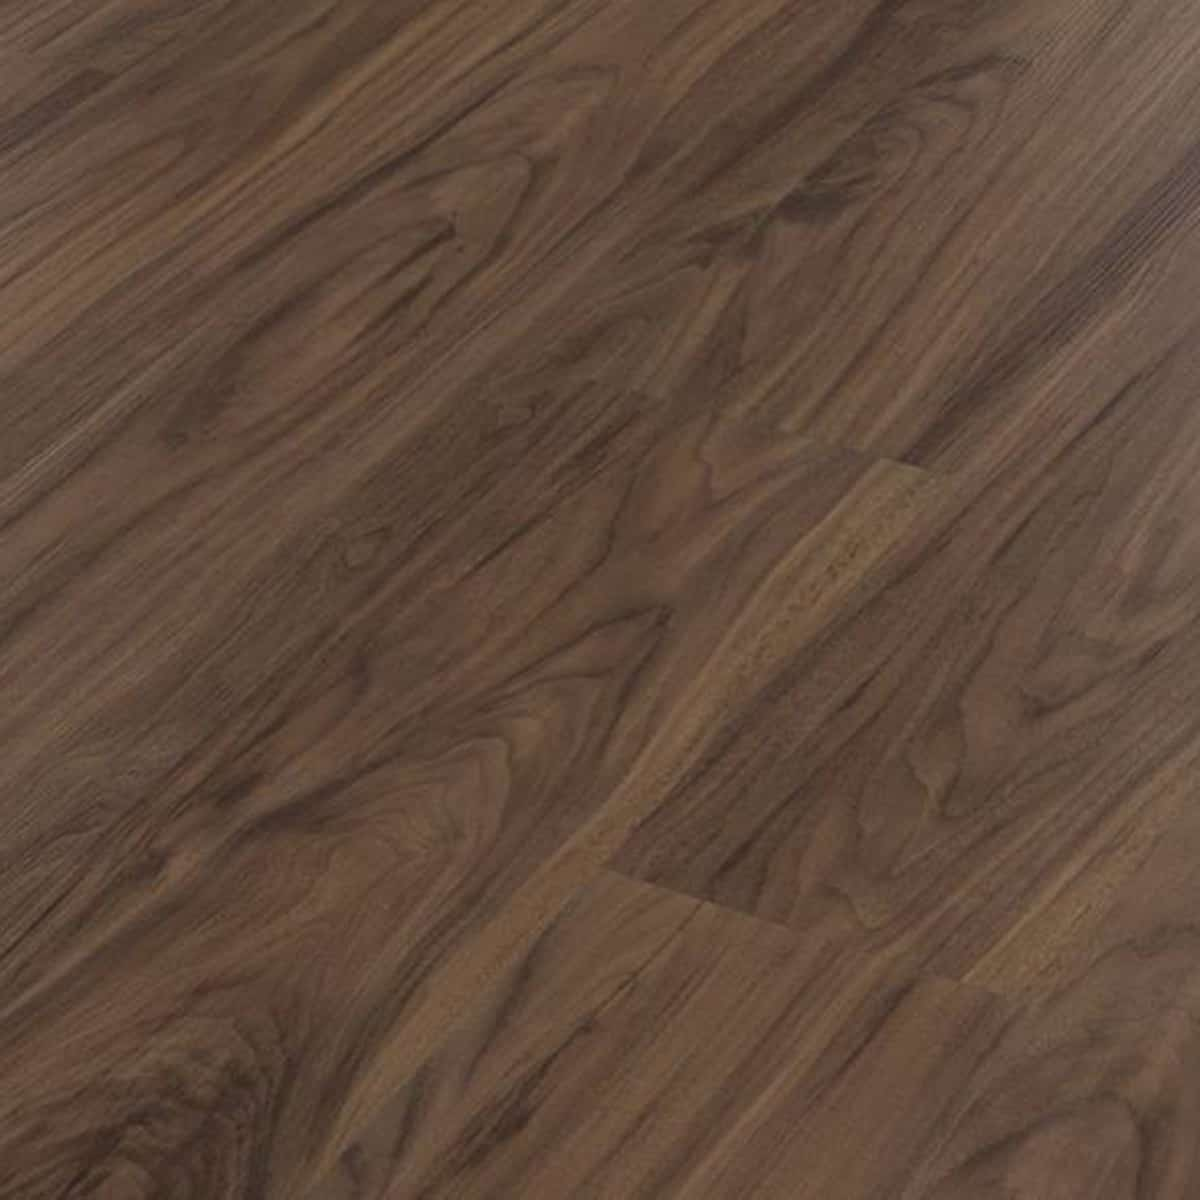 Karndean Korlok Texas Whiskey Walnut LVP Flooring